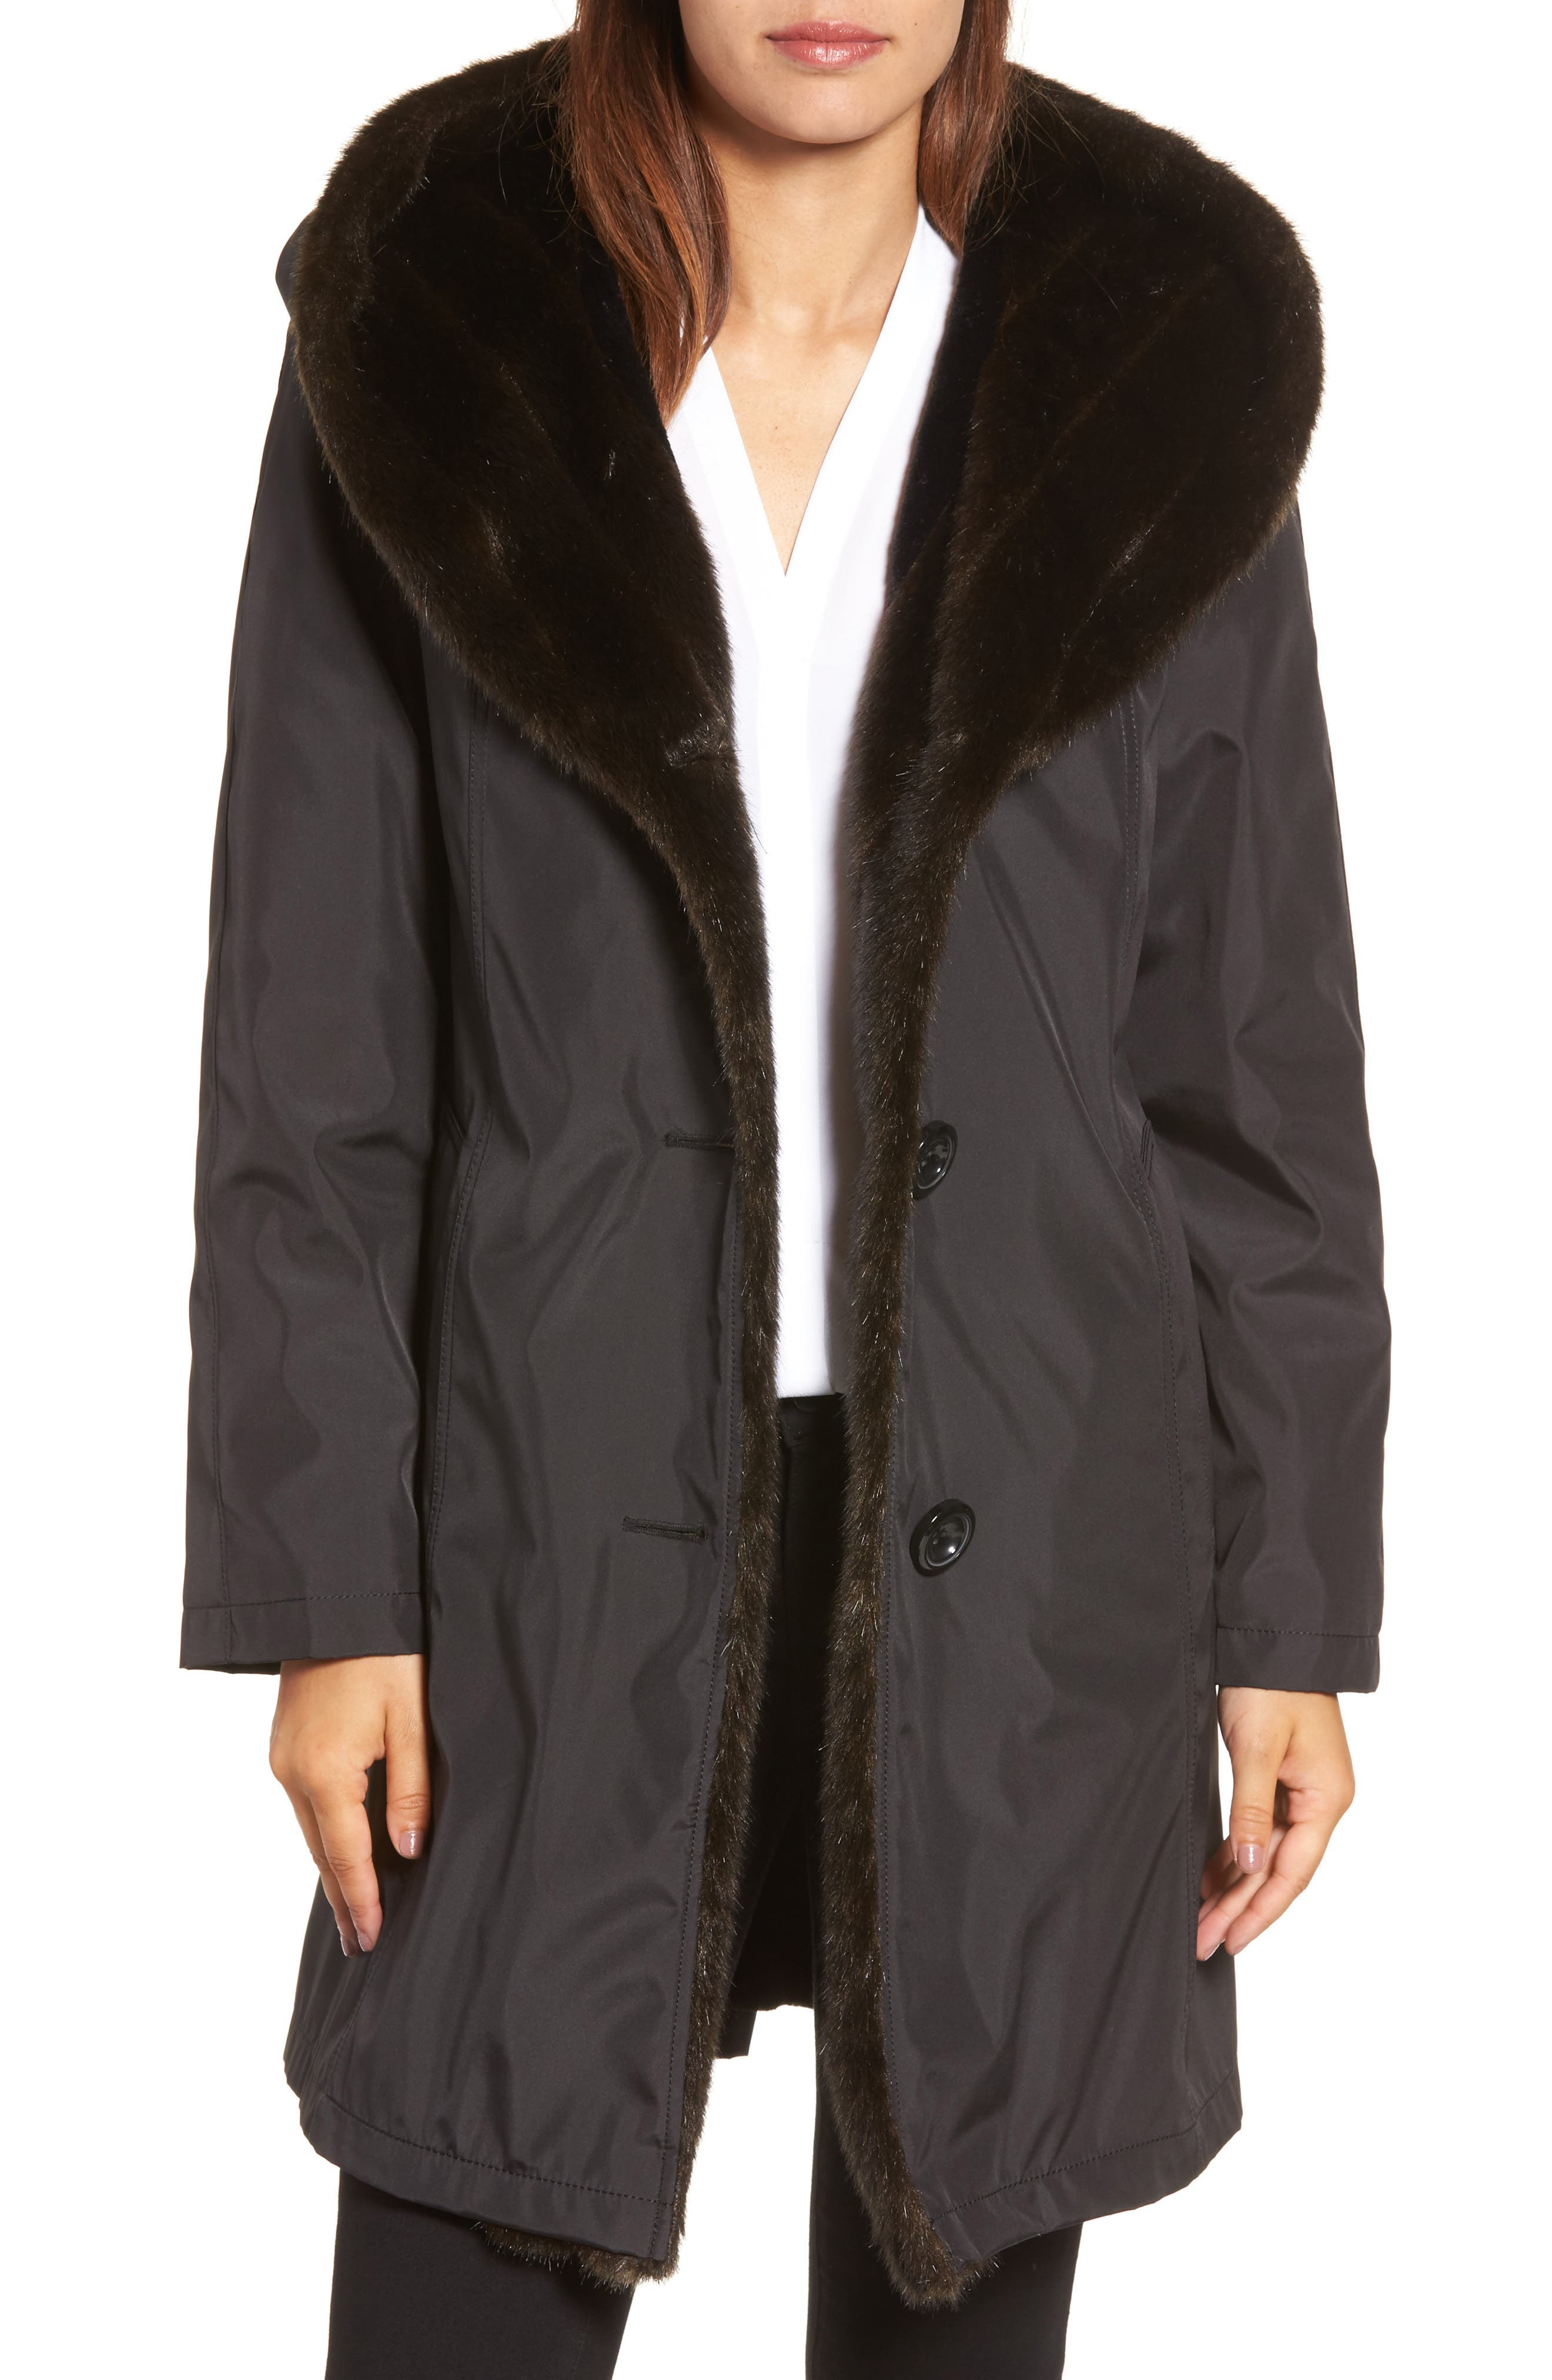 Storm Coat with Faux Fur Trim & Lining,                         Main,                         color, 001